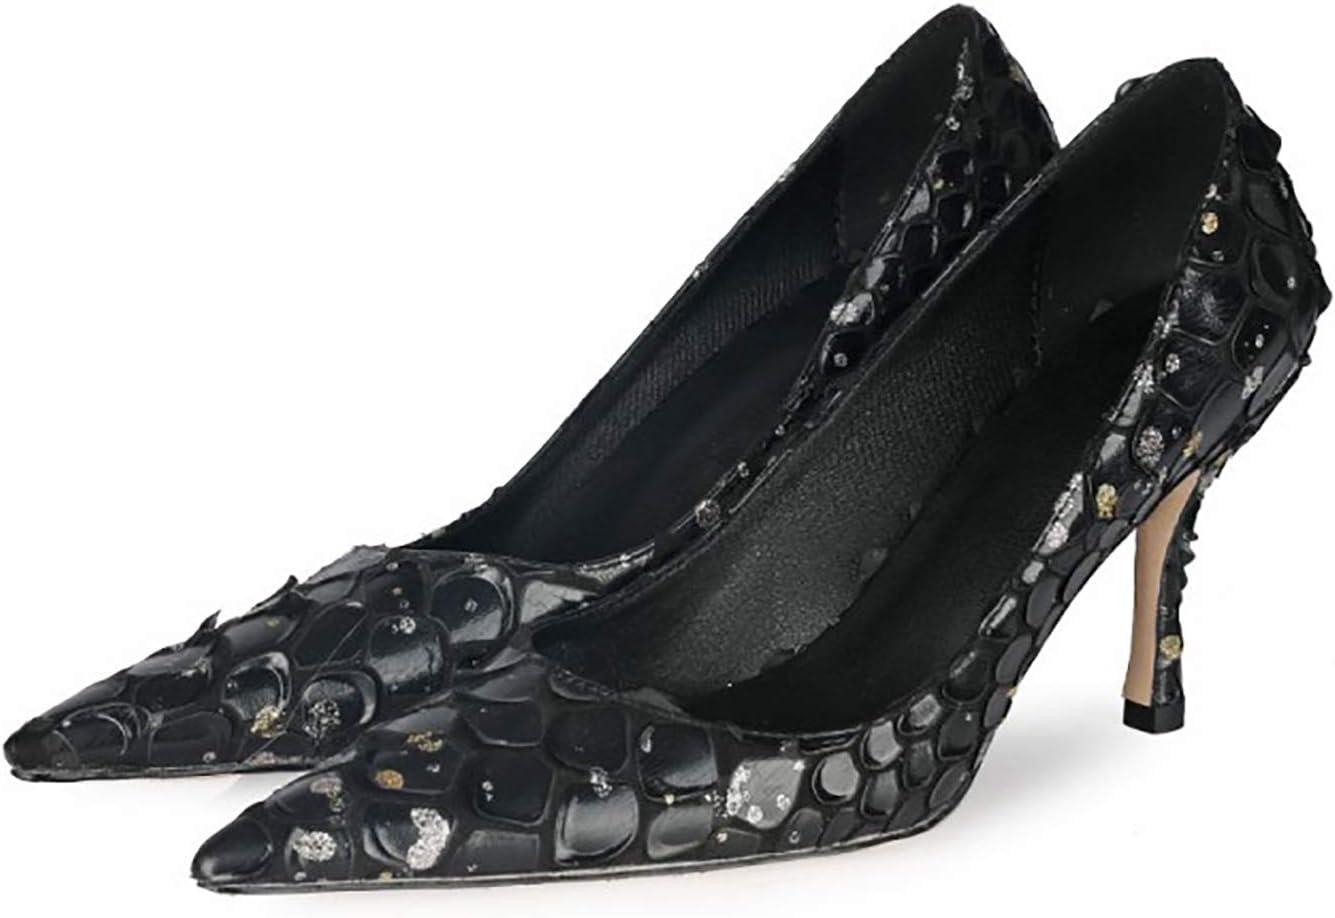 RHSMY Women's Bargain sale High Heels 8.5cm 3.34in Shoes Single Great interest Ladies Sexy F